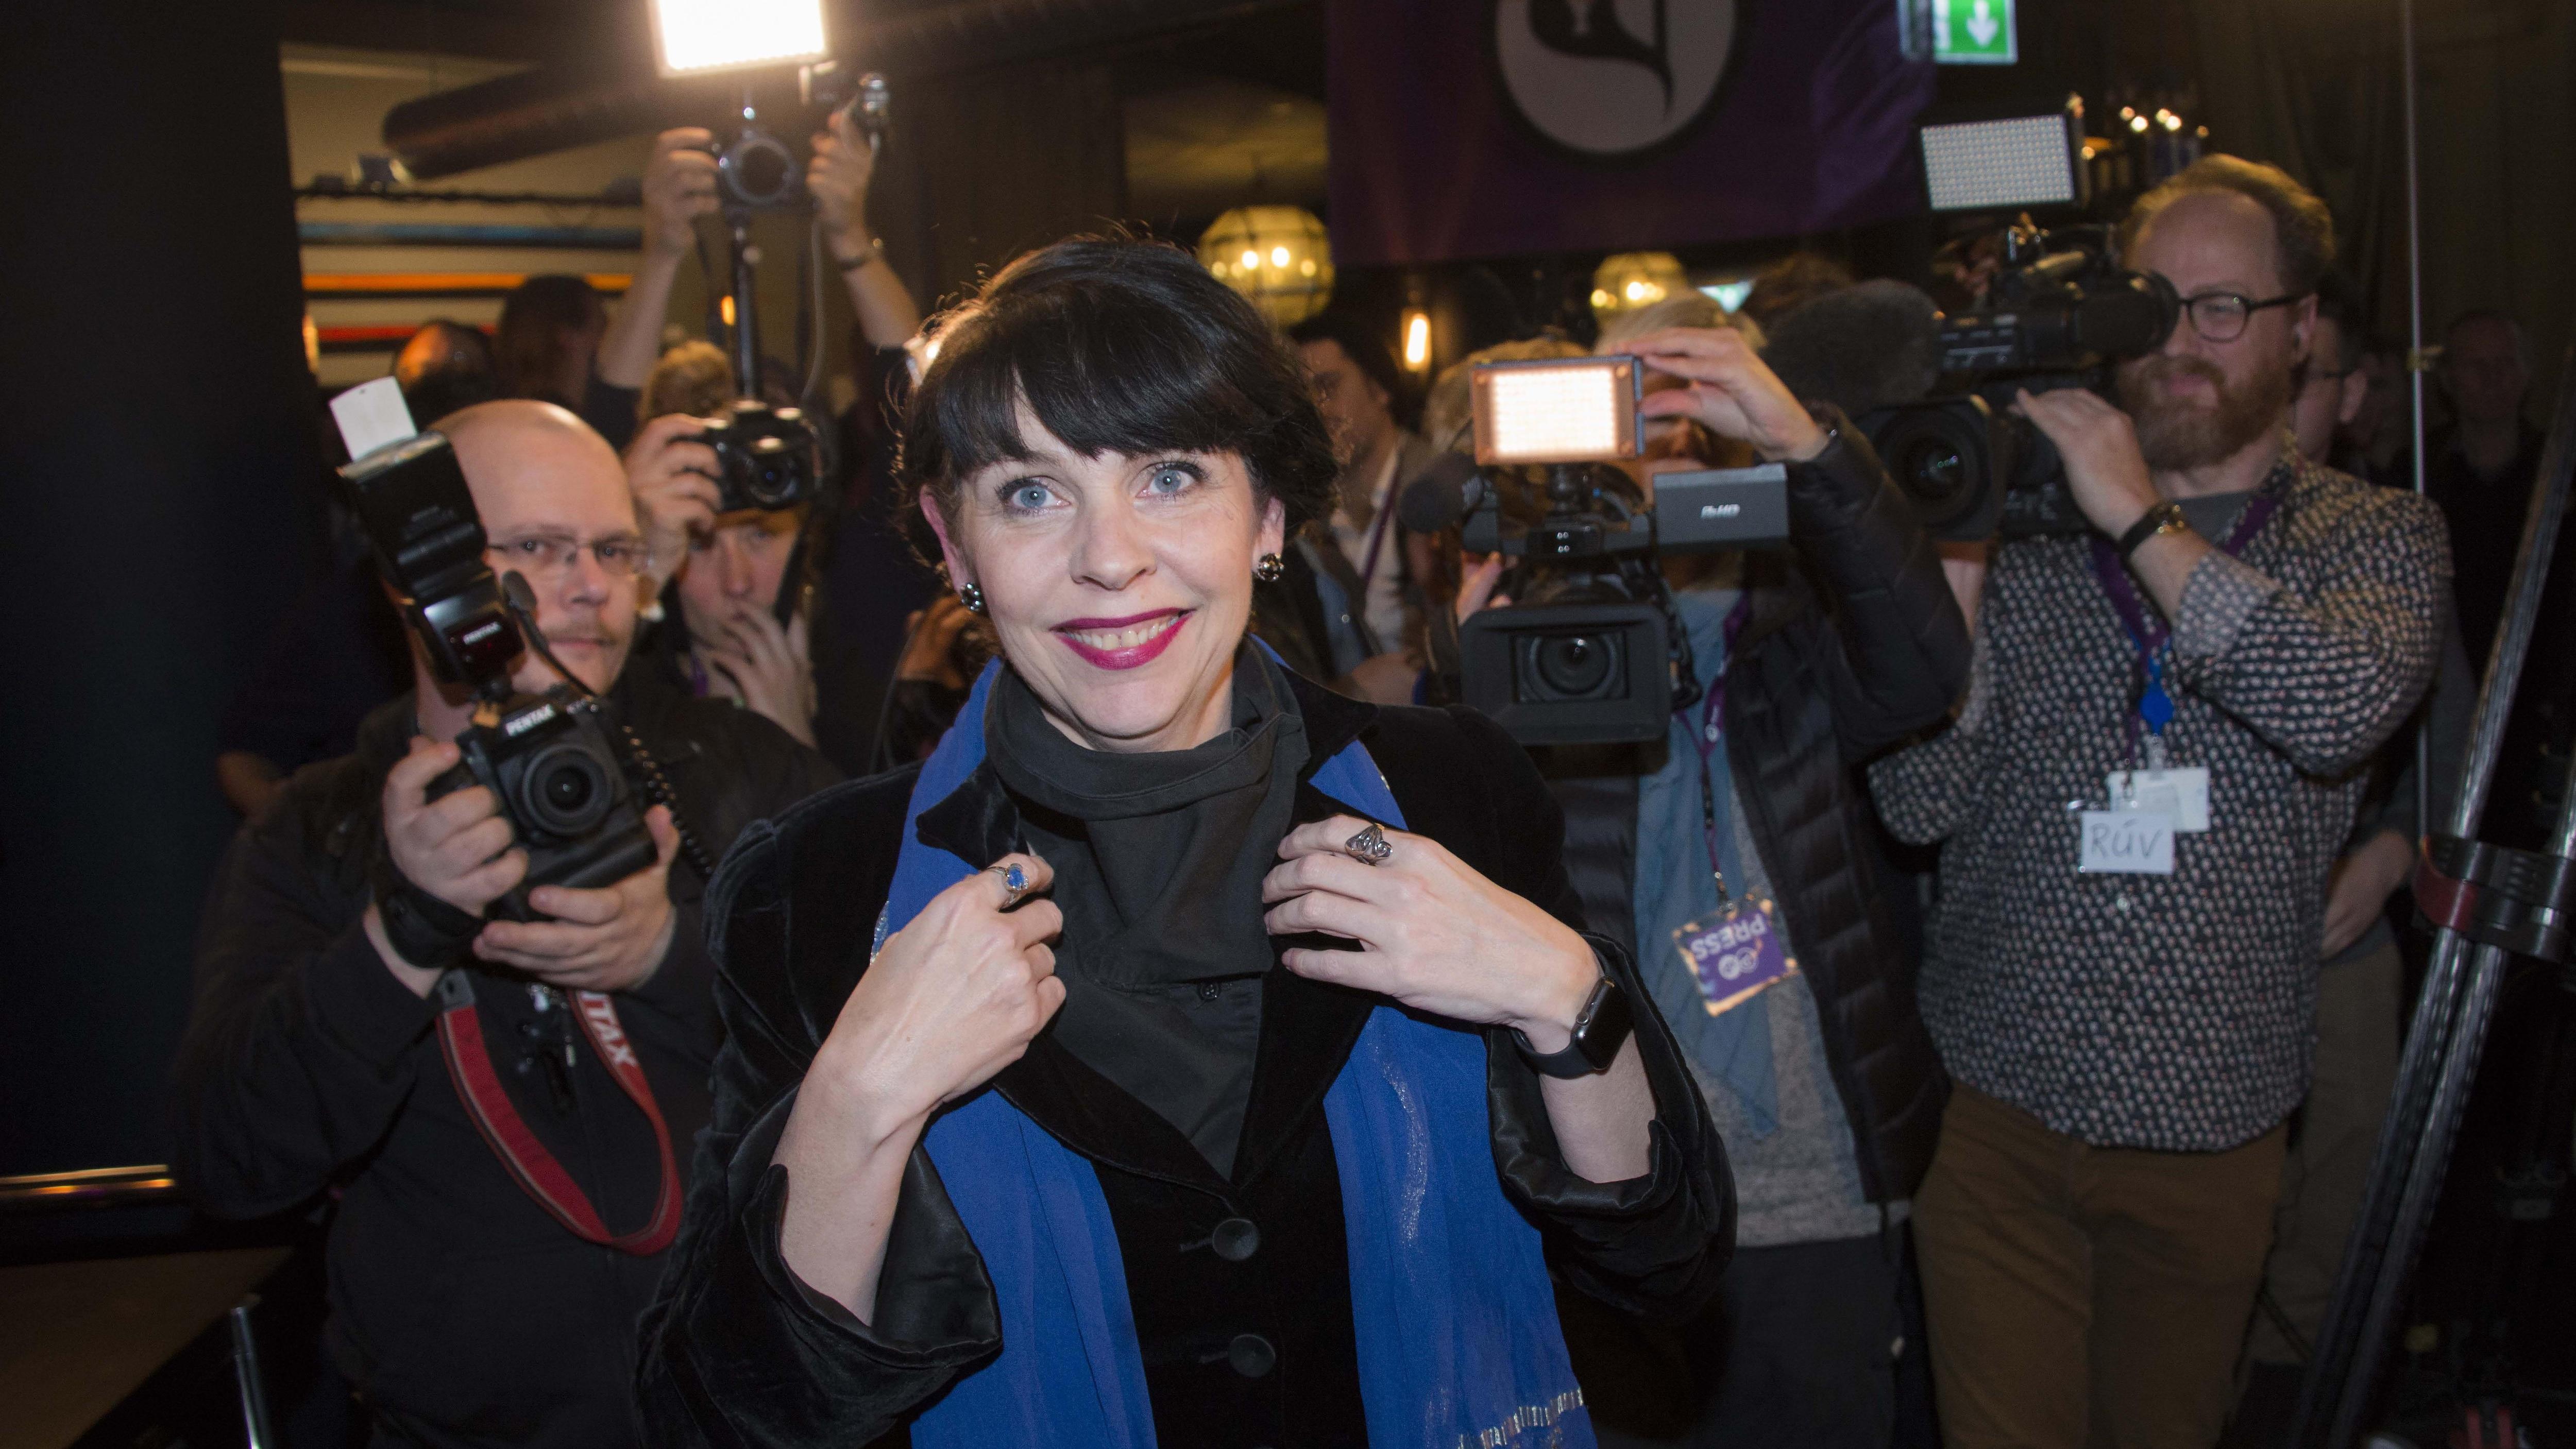 Le Parti pirate tentera de sortir l'Islande de l'impasse